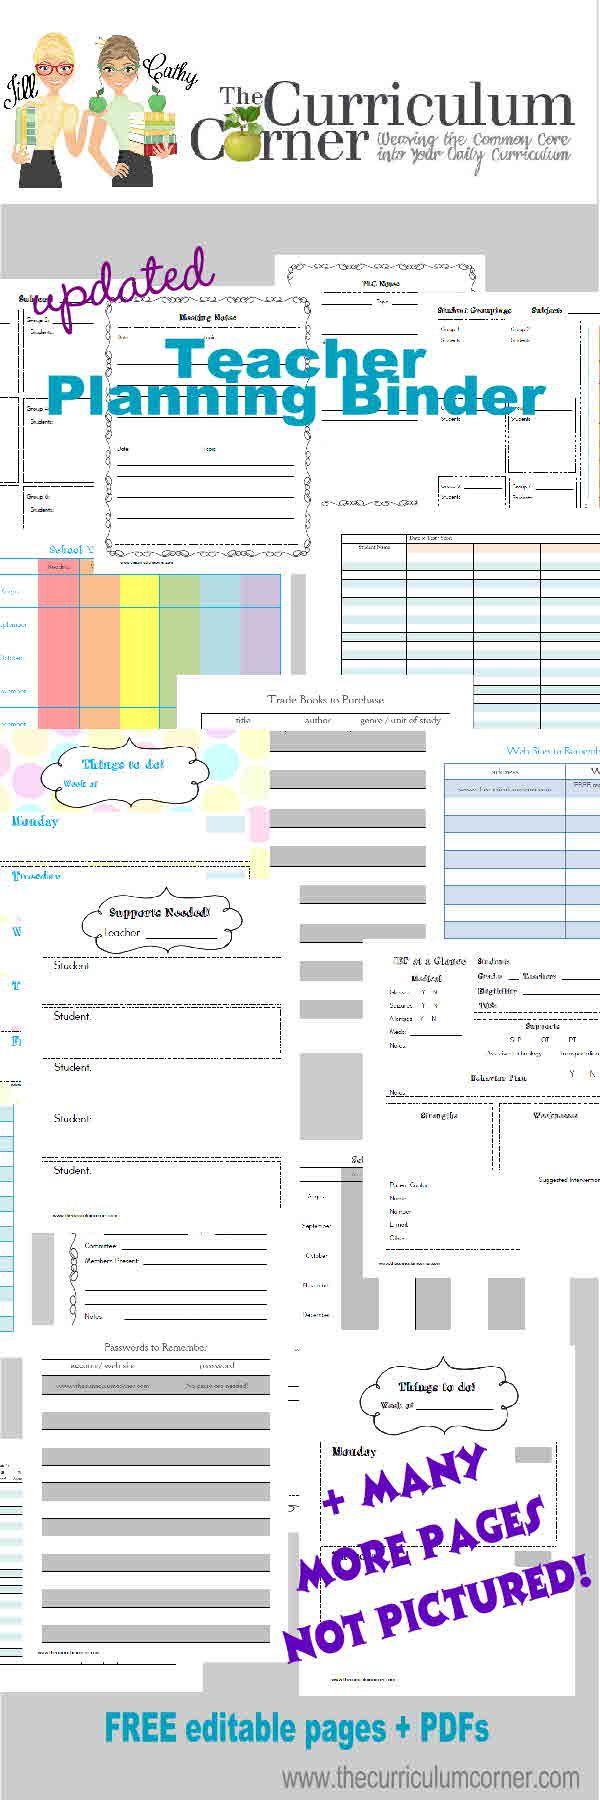 Updated Teacher Planning Binder Free from The Curriculum Corner